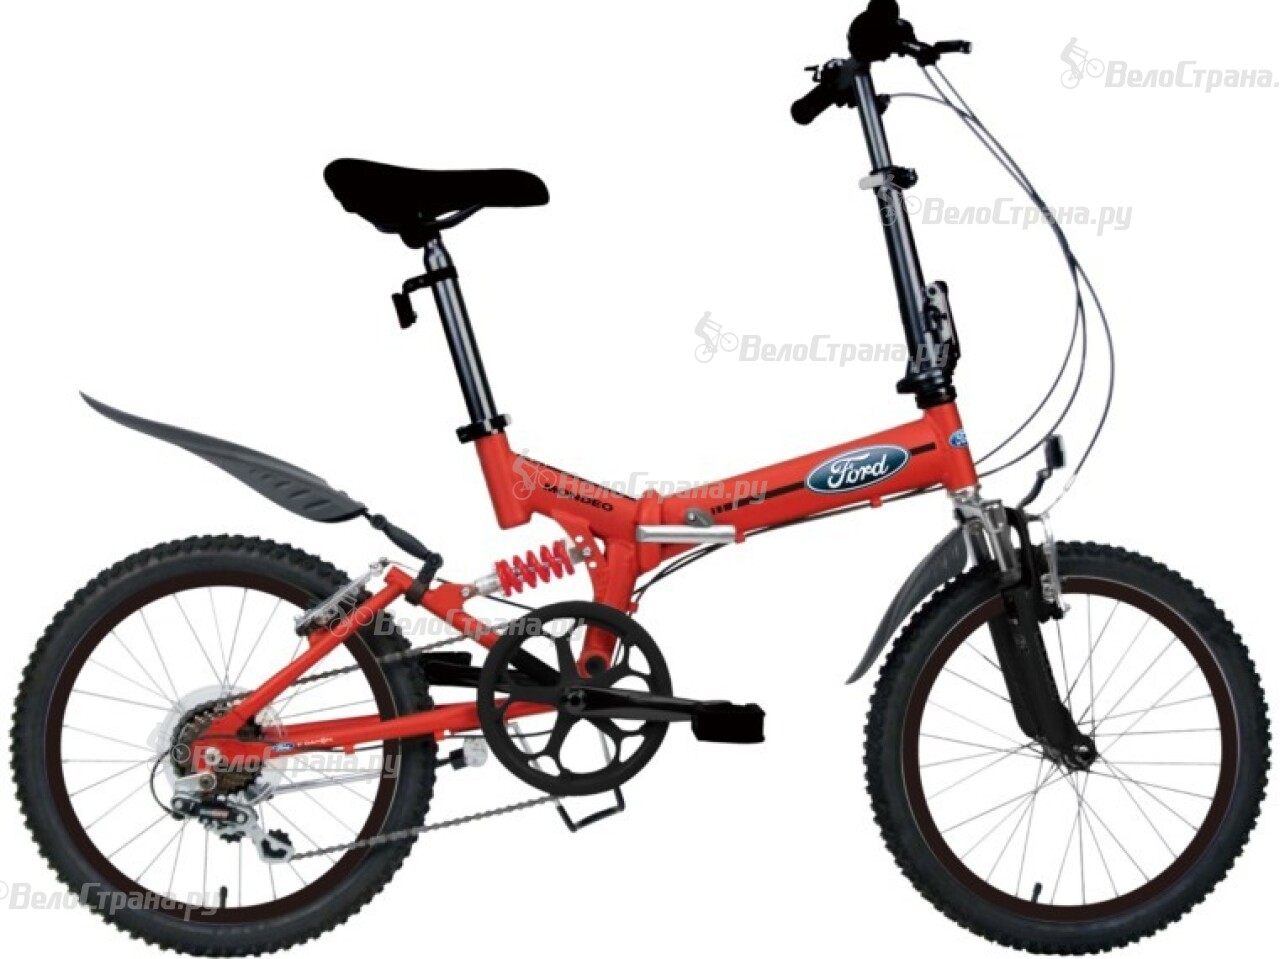 Велосипед Ford 20 Mondeo (2016) redpower 21003 ford mondeo серый